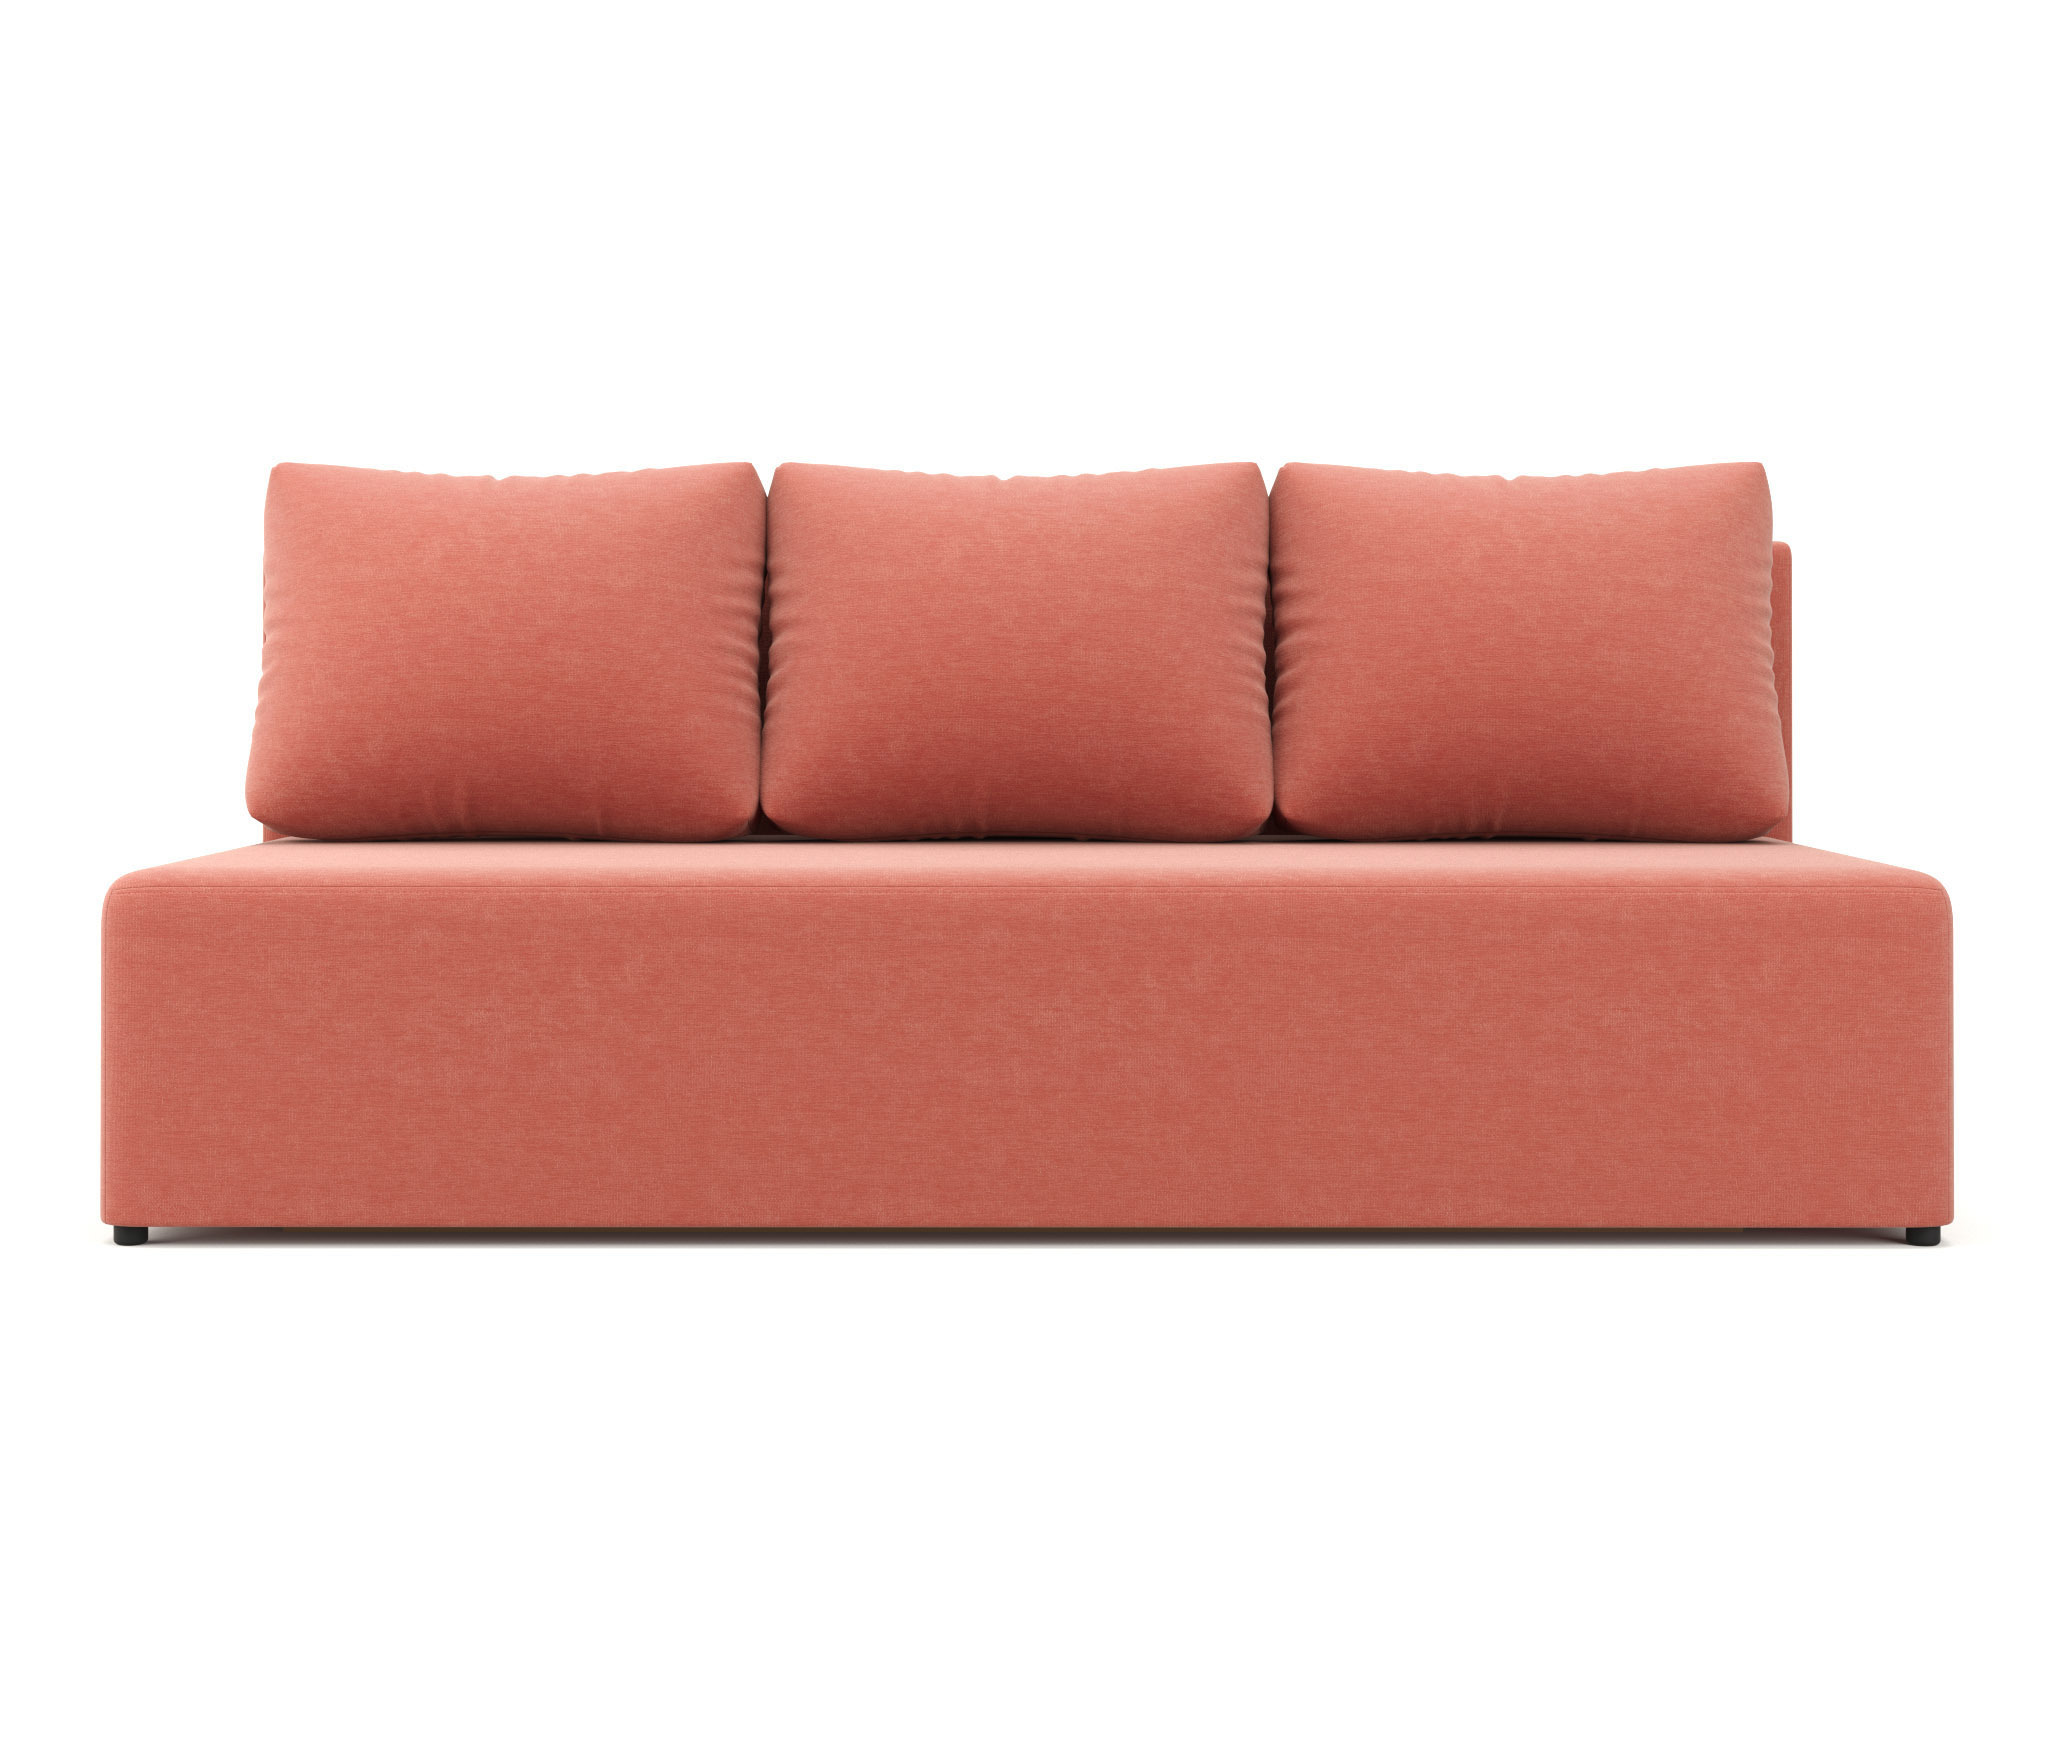 Нексус диван-кровать Faro 106Мягкая мебель<br>Размер (ШхВхГ, см):185х73х80&#13;Размер спального места (ШхД, см):130х185&#13;]]&gt;<br><br>Длина мм: 1850<br>Высота мм: 730<br>Глубина мм: 800